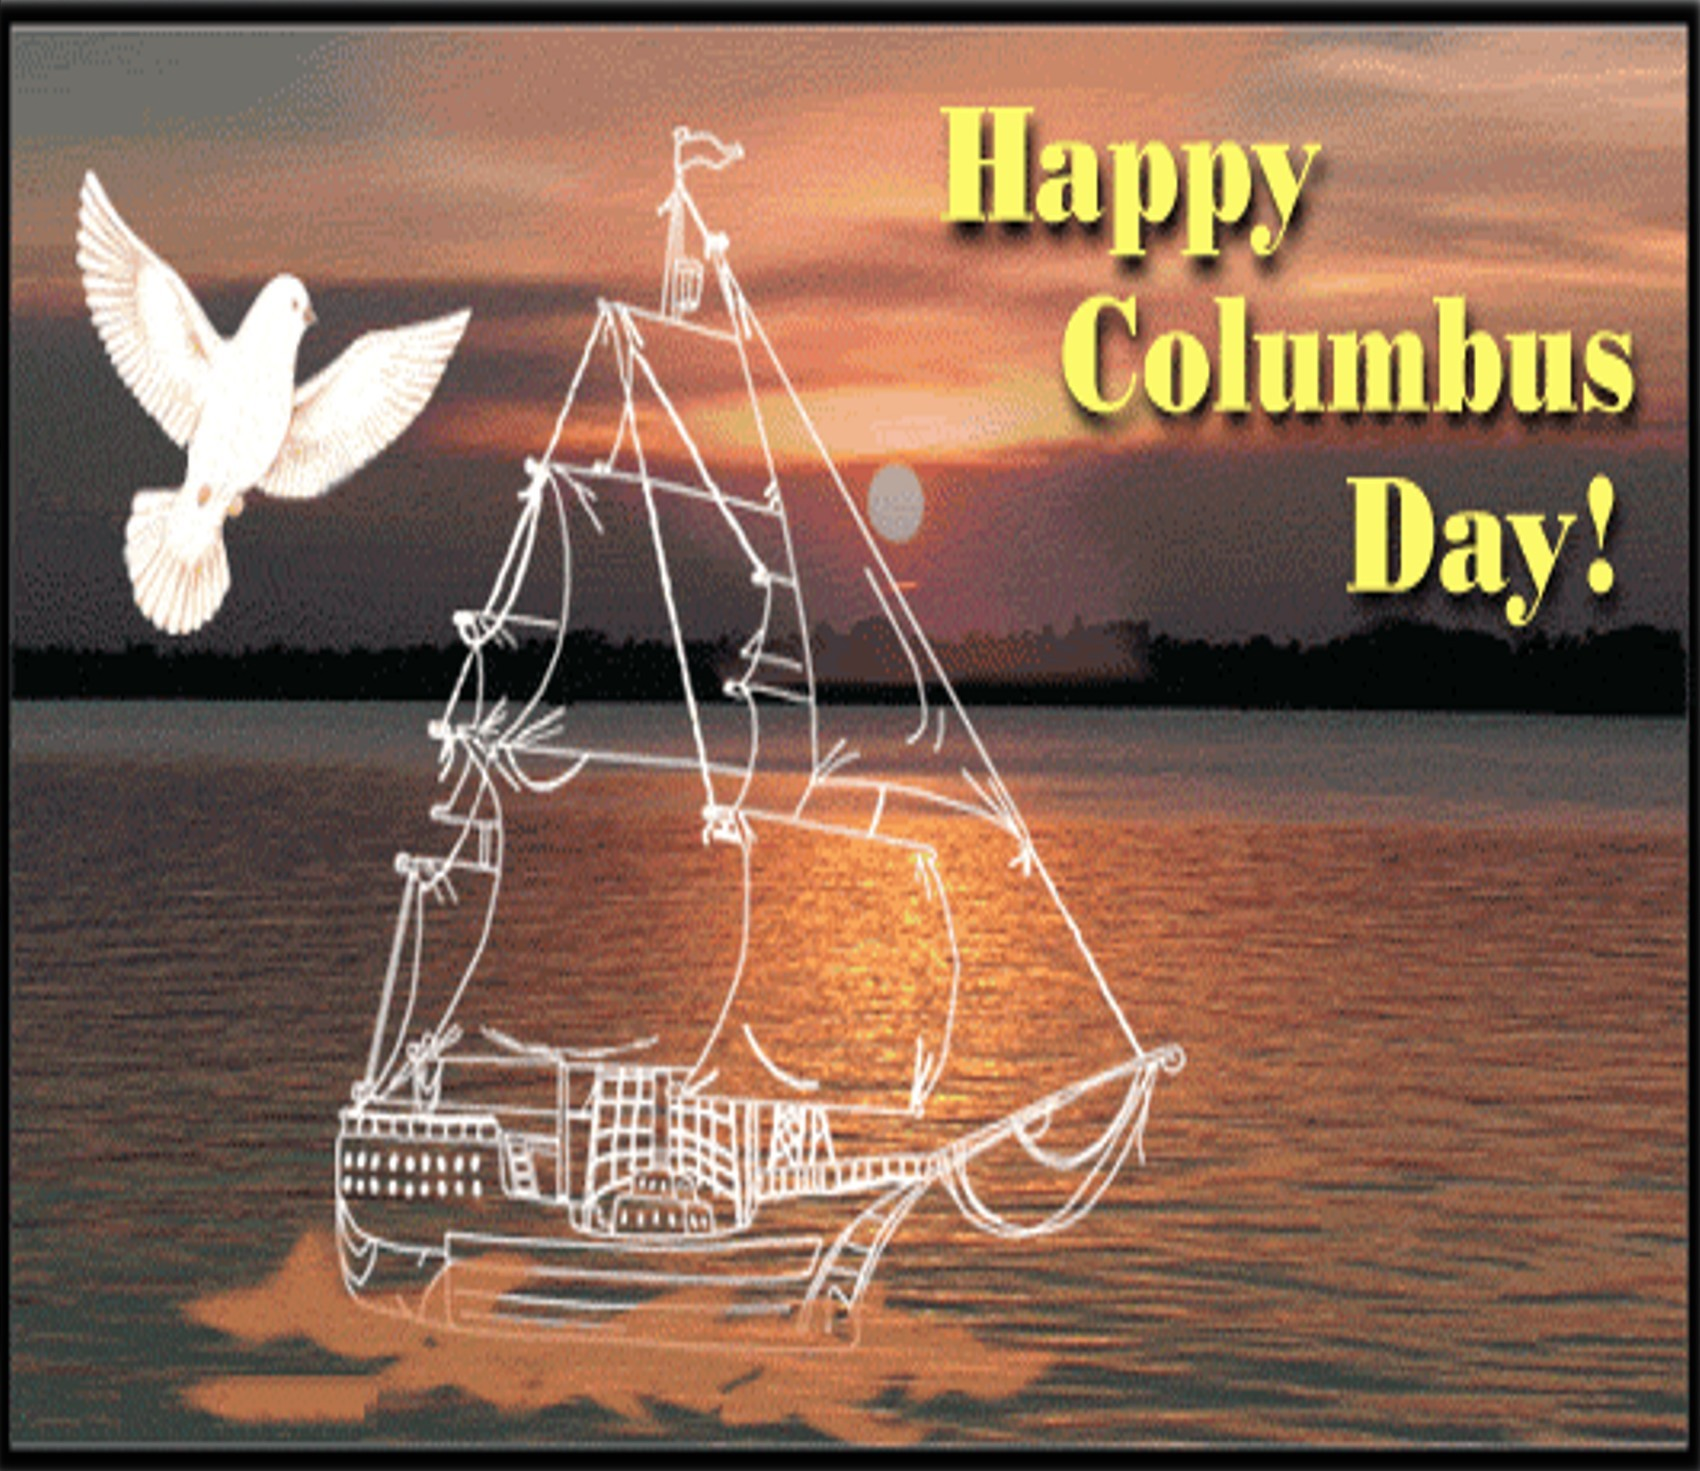 Columbus Day 2014